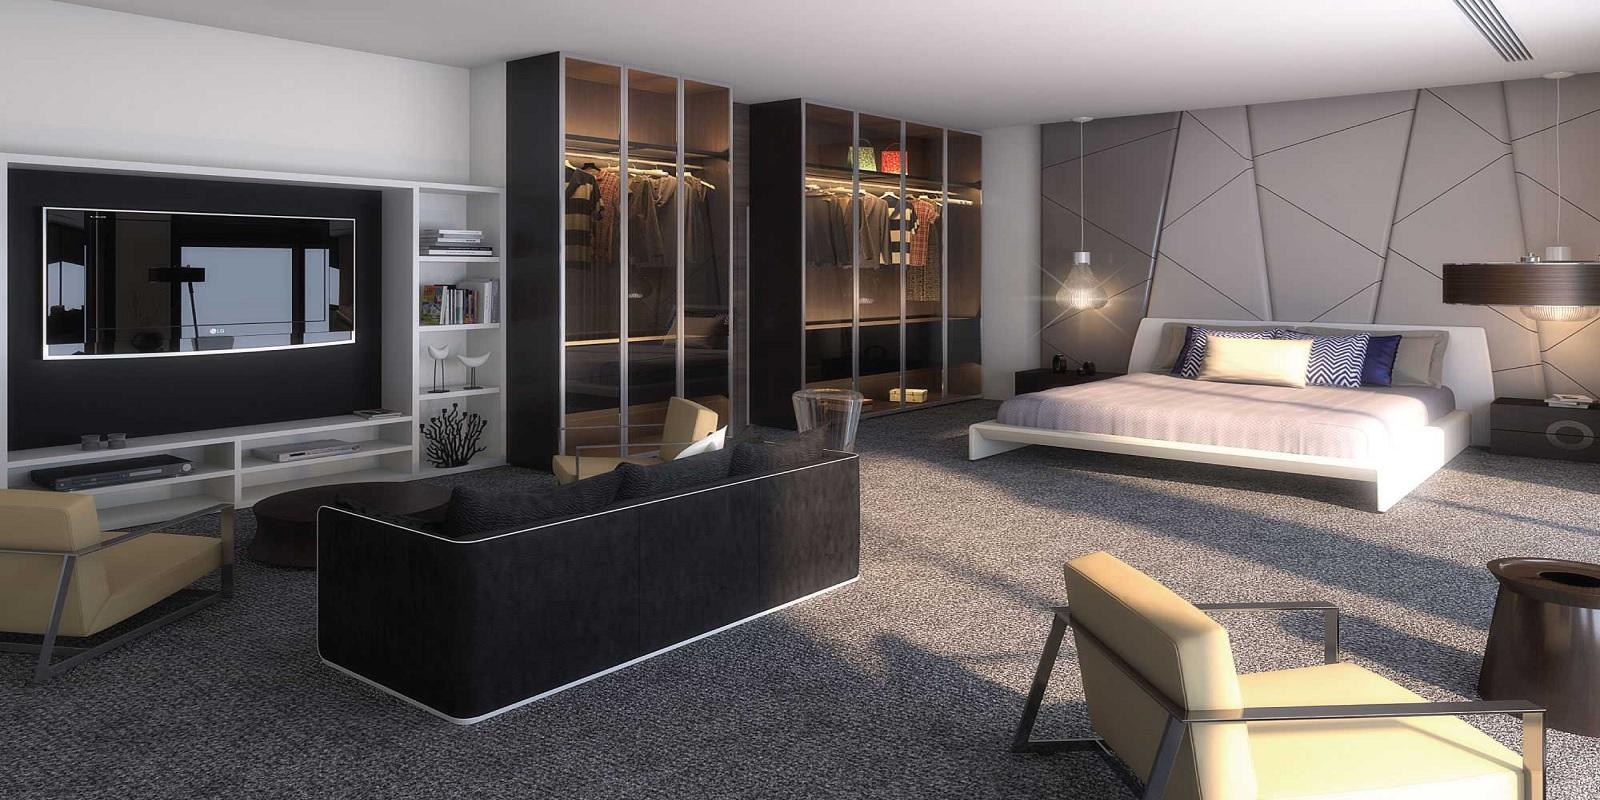 marathon emblem apartment interiors9